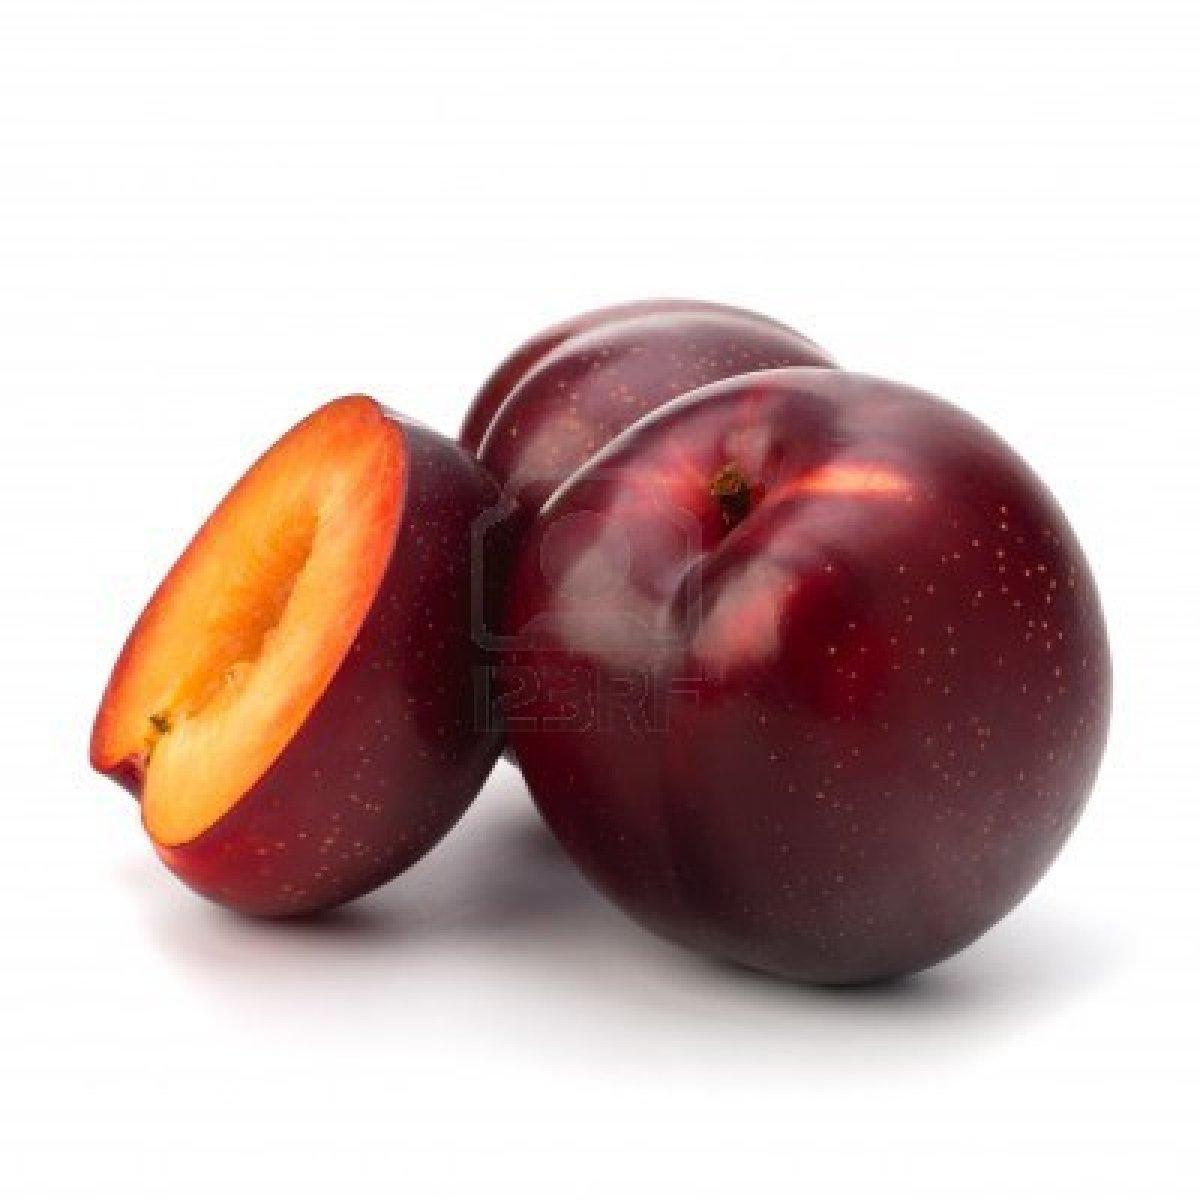 Plums, The wonder Fruit! | theinnerharmony